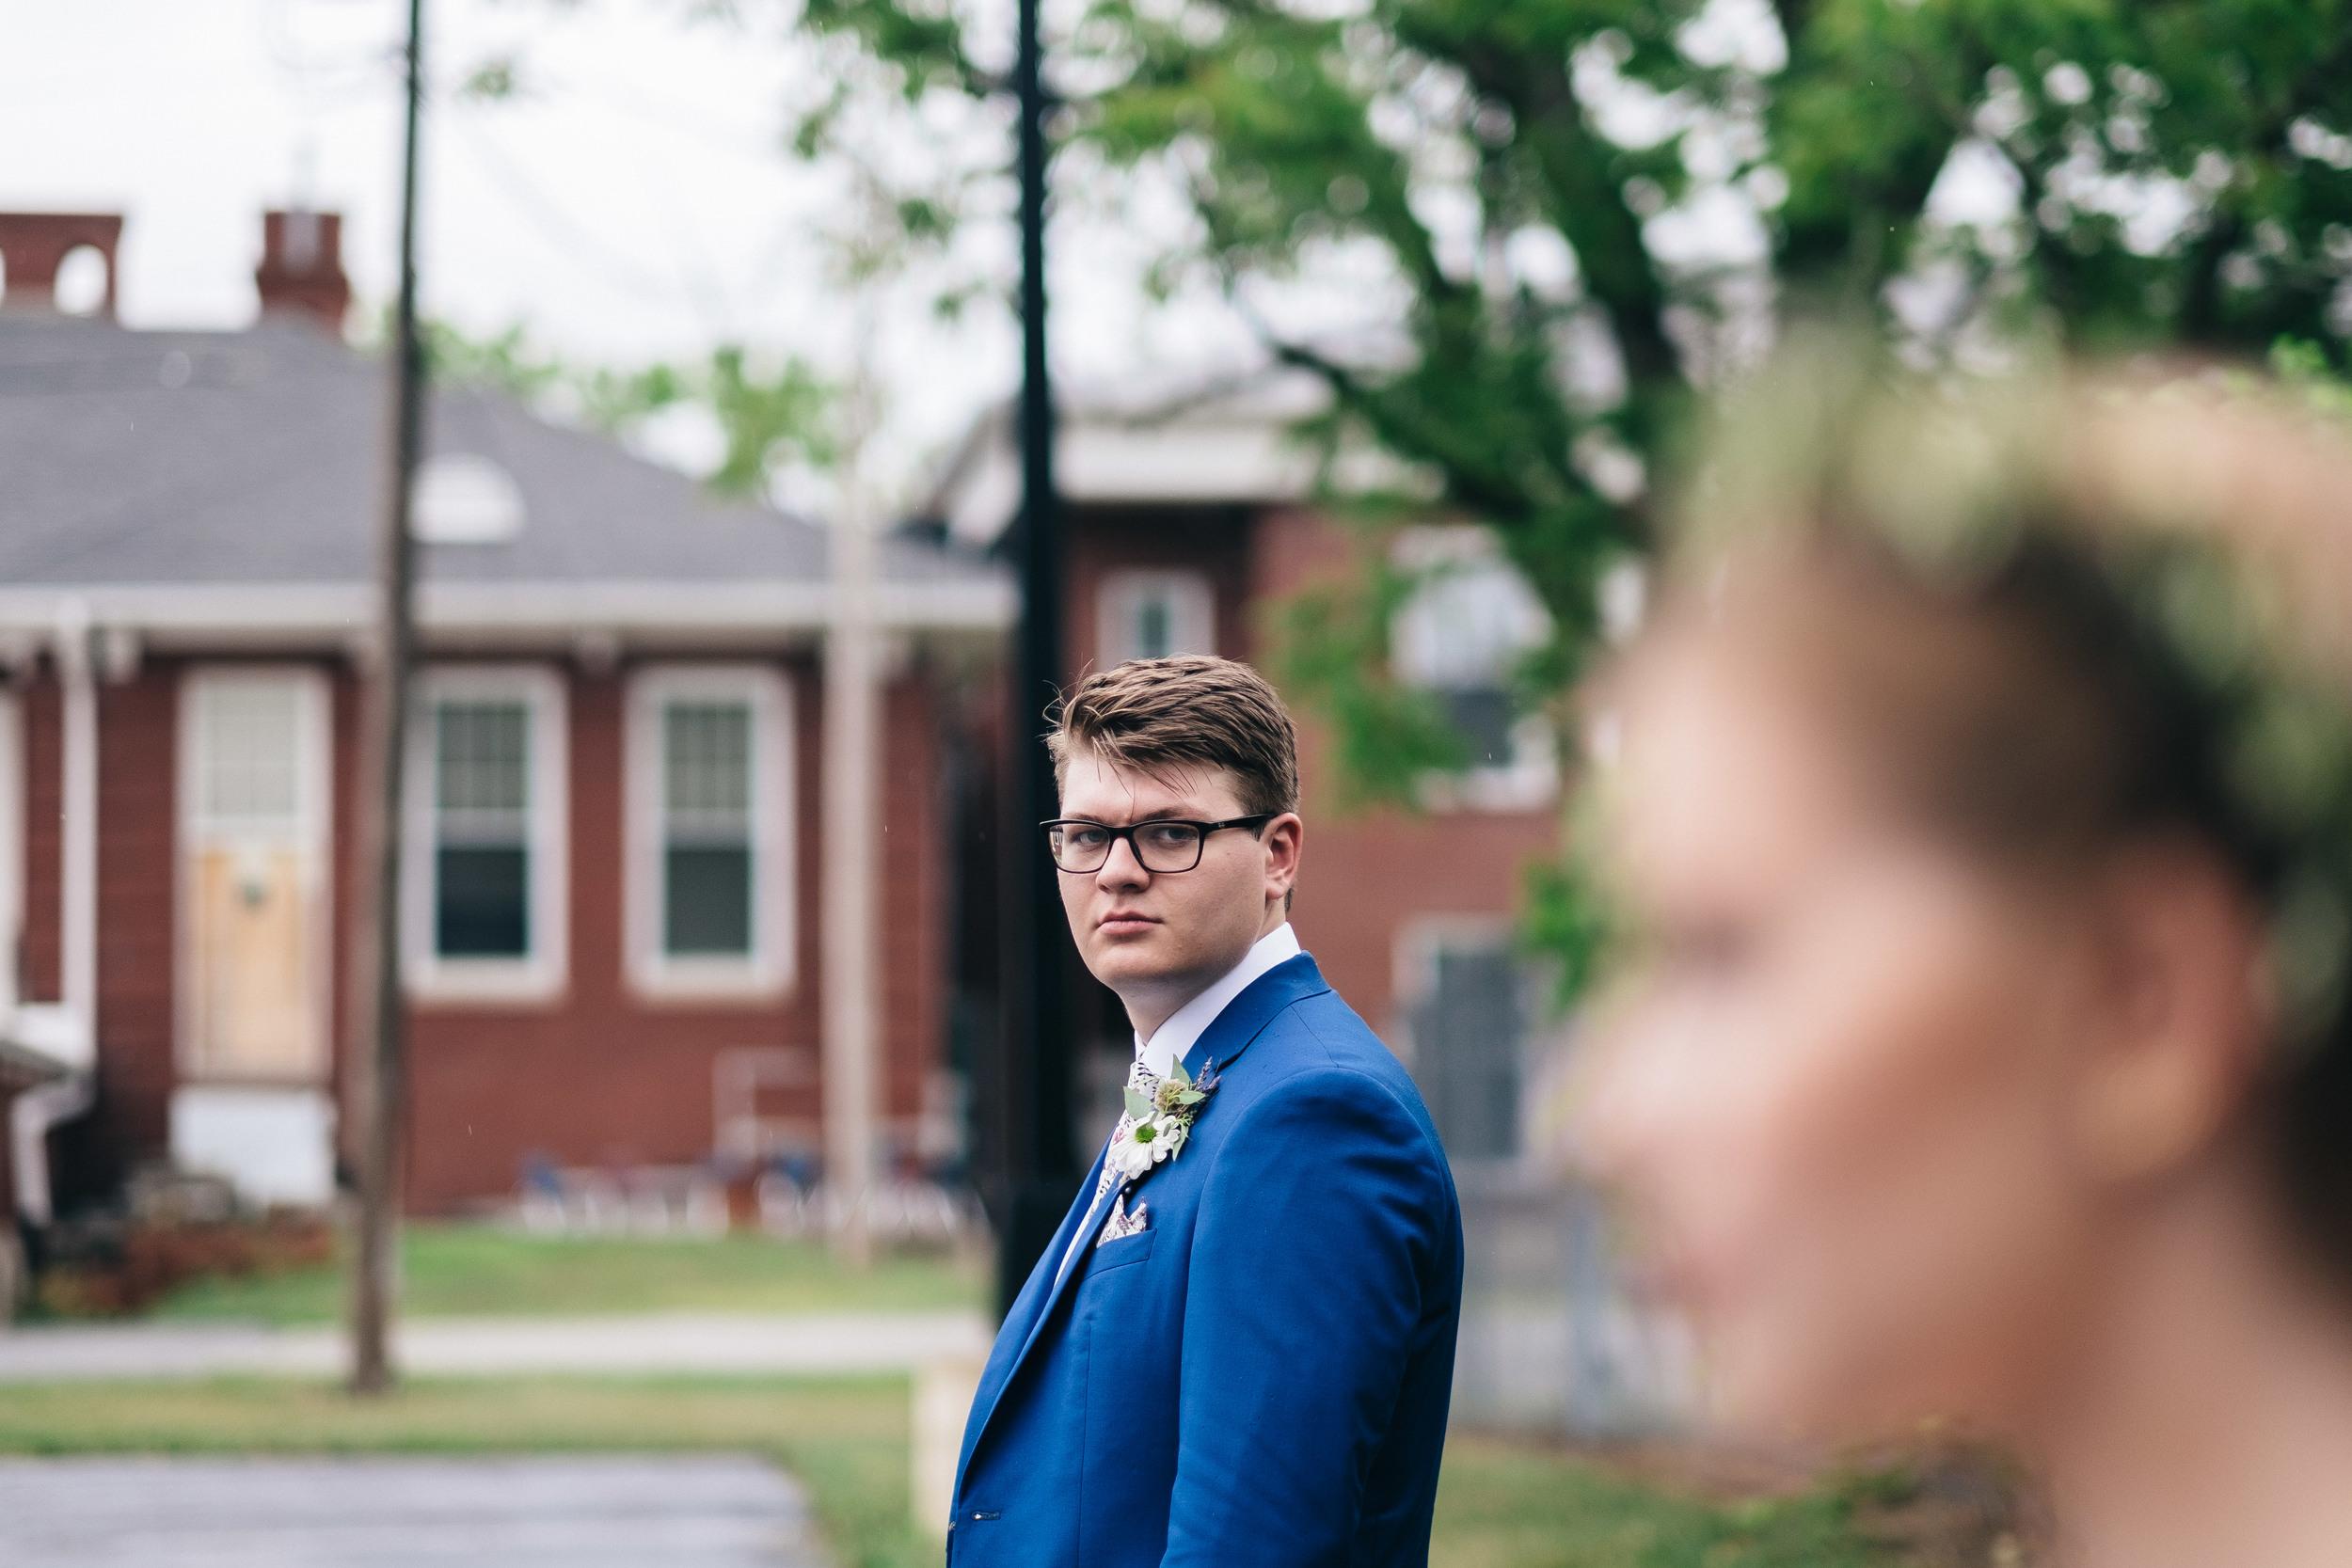 Groom in jet blue suit.